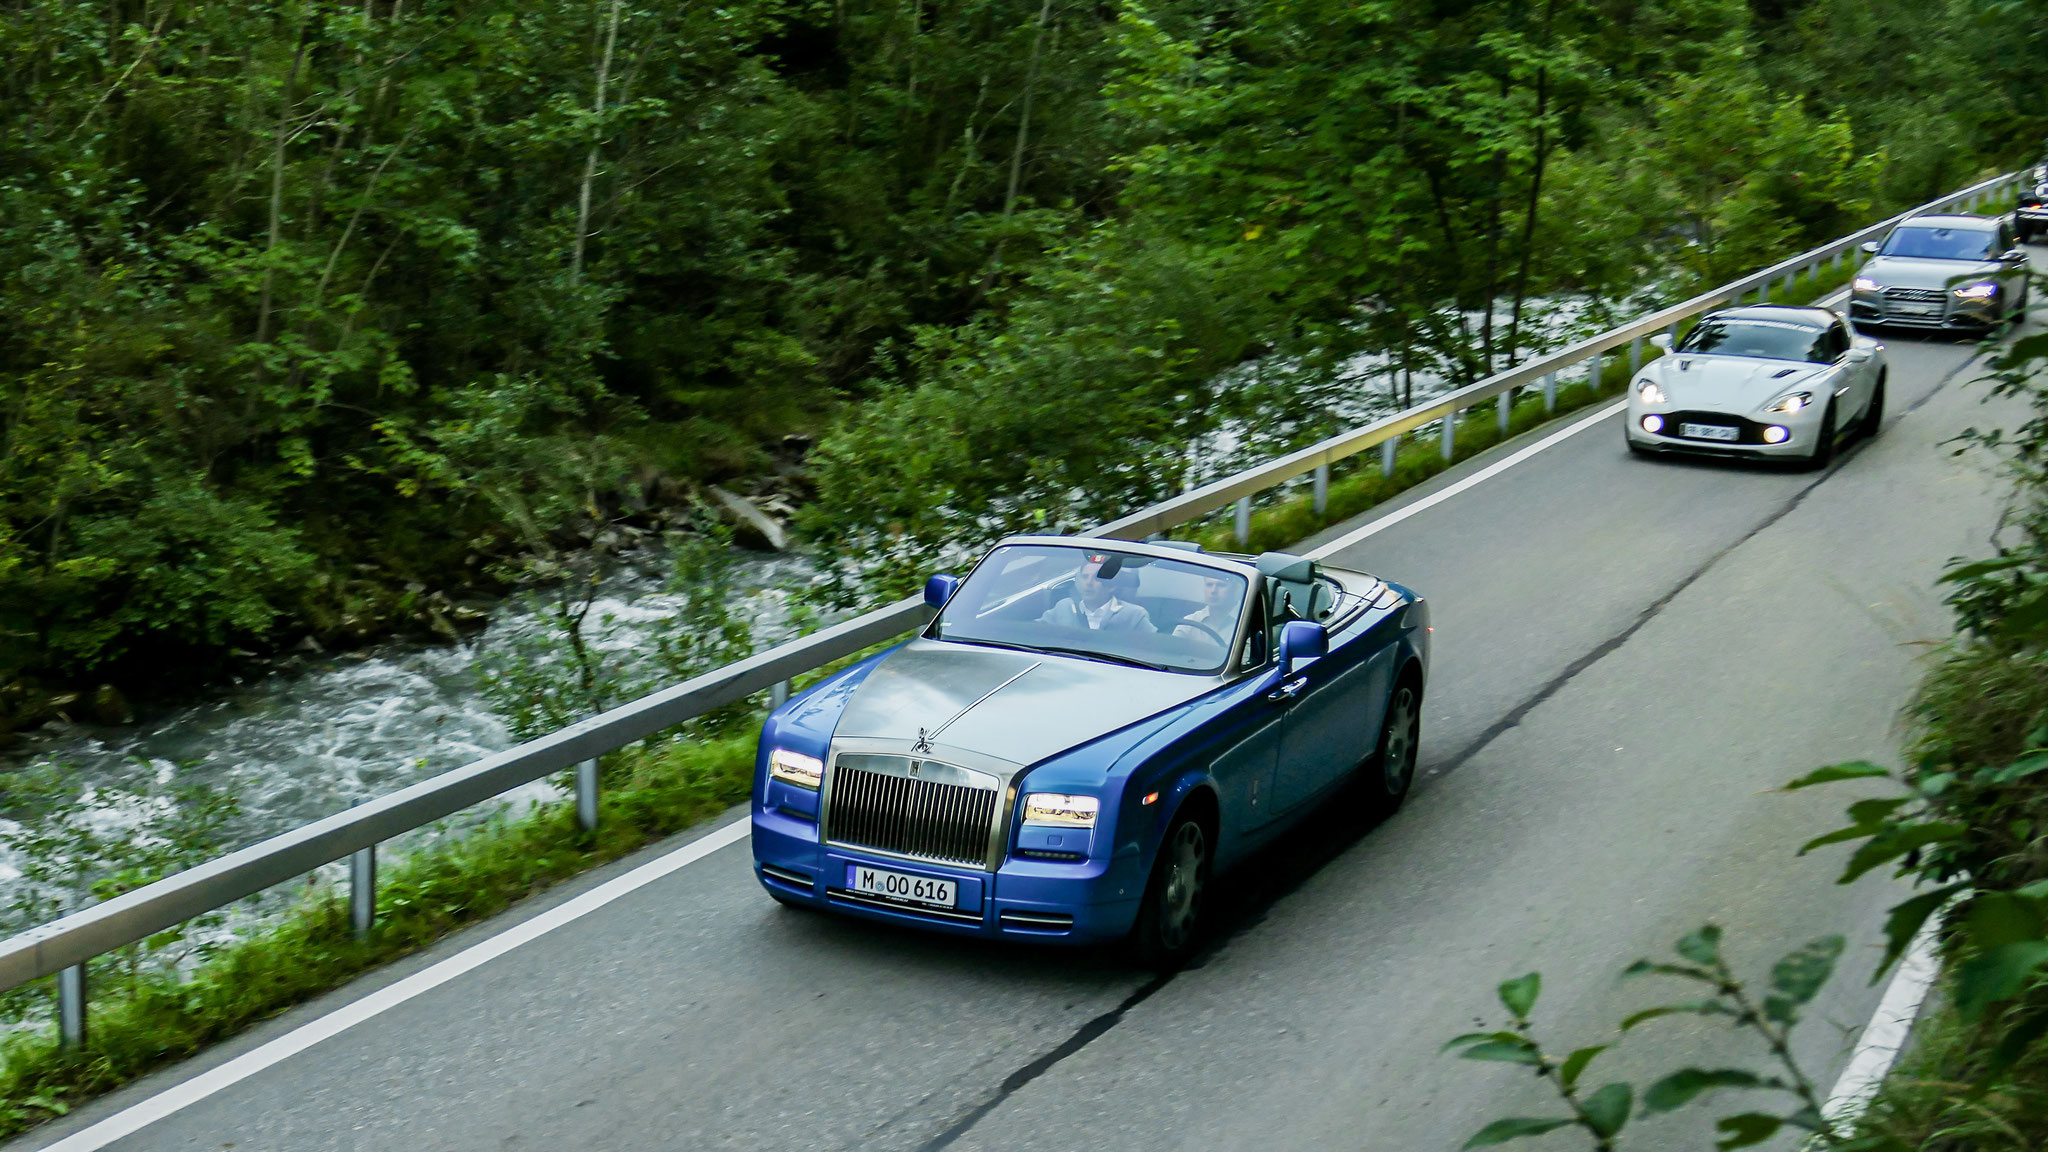 Rolls Royce Drophead - M-OO-616